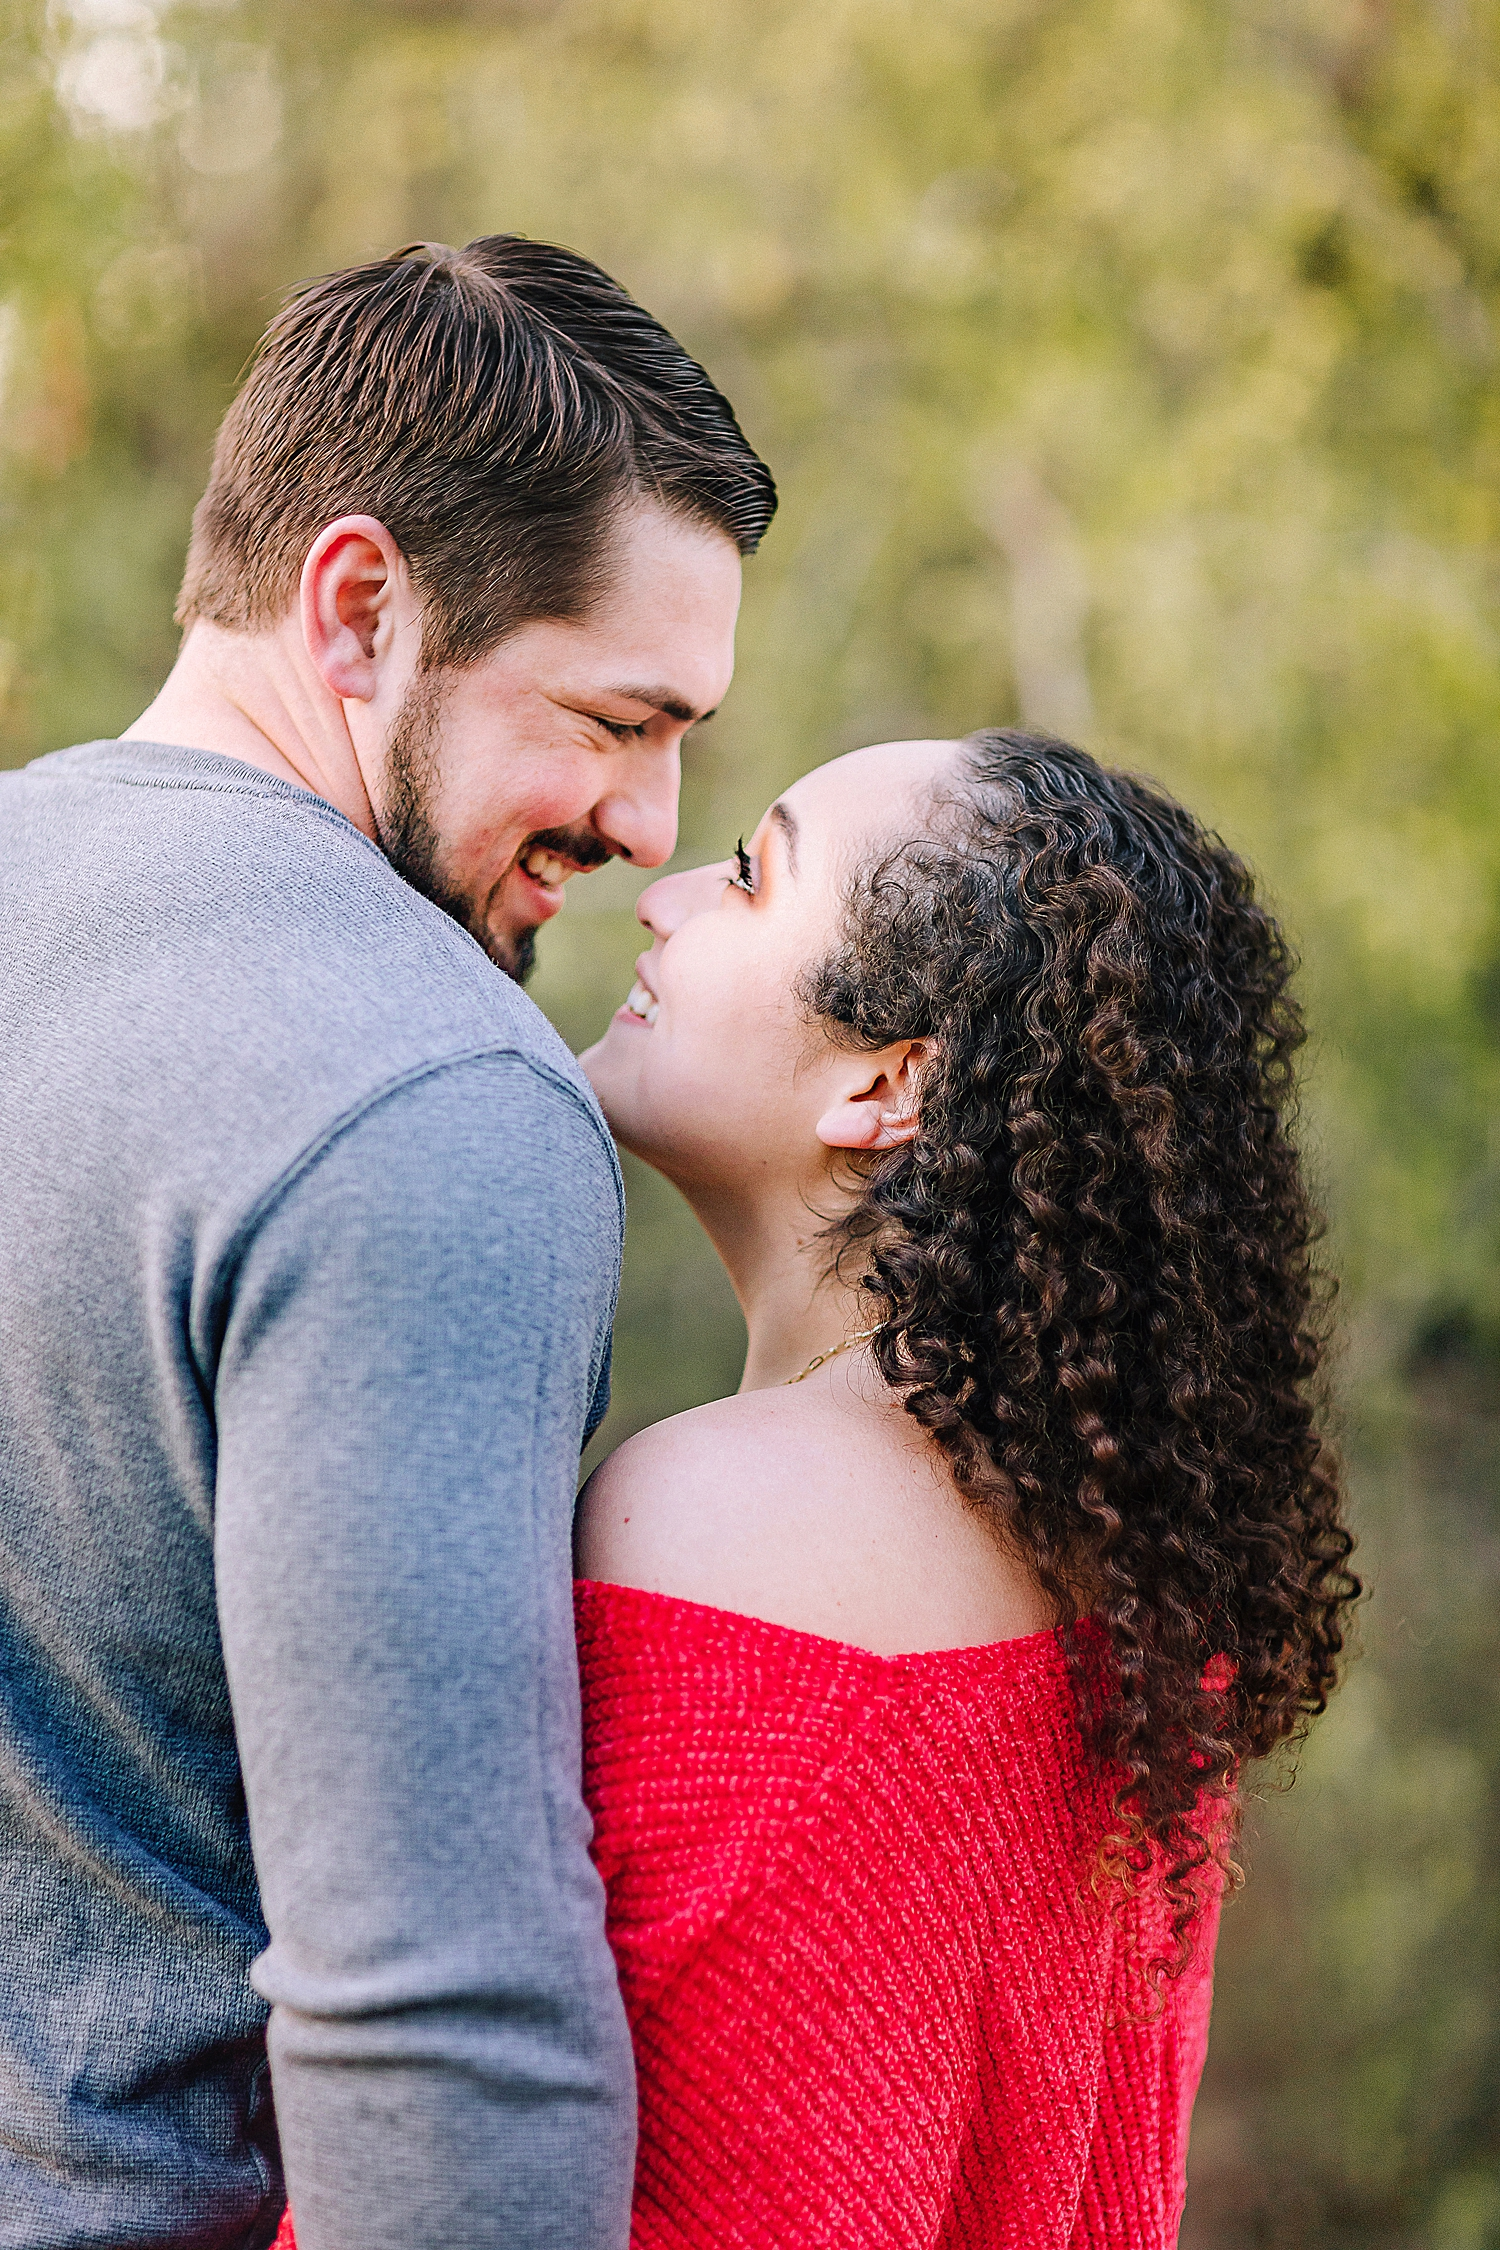 Engagement-photo-session-gruene-new-braunfels-texas-carly-barton-photography_0016.jpg